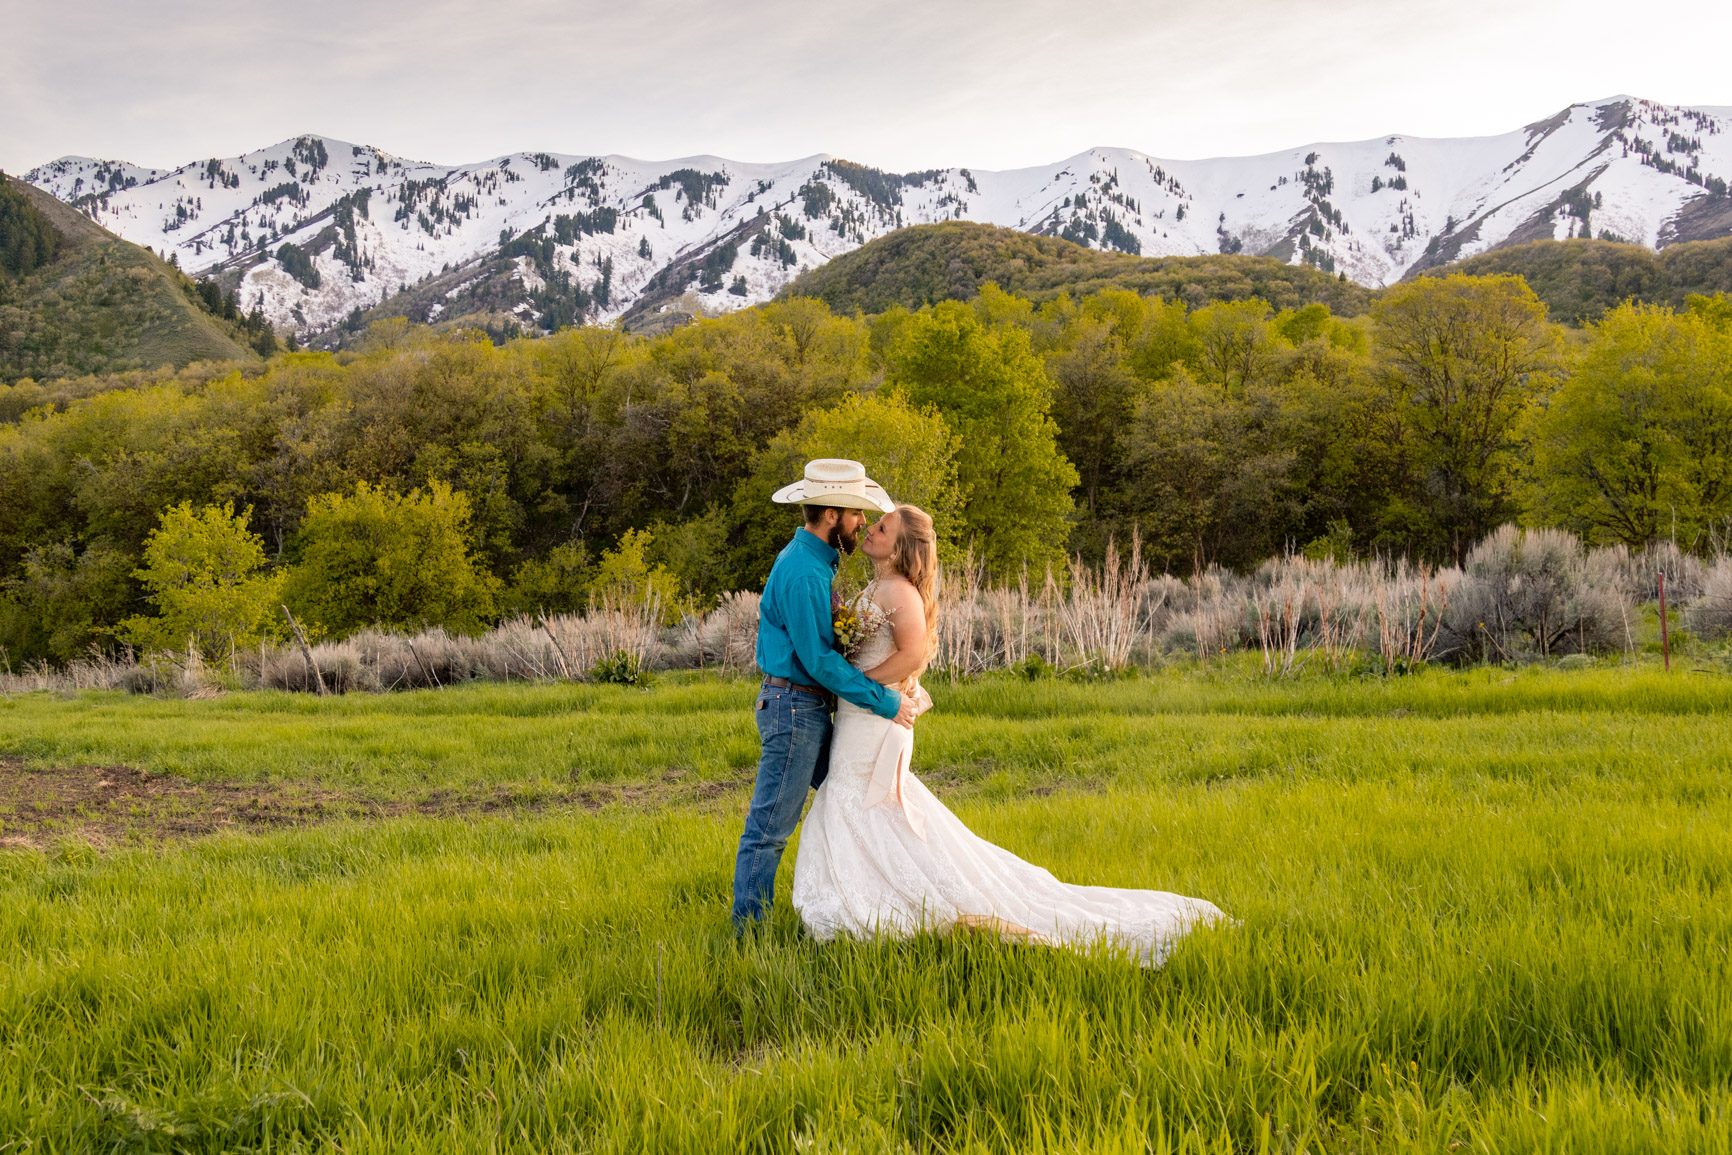 Utah Rocky Mountain Elopement Wasatch Mountains Bridal Shoot Halie West Adventure Photography 8